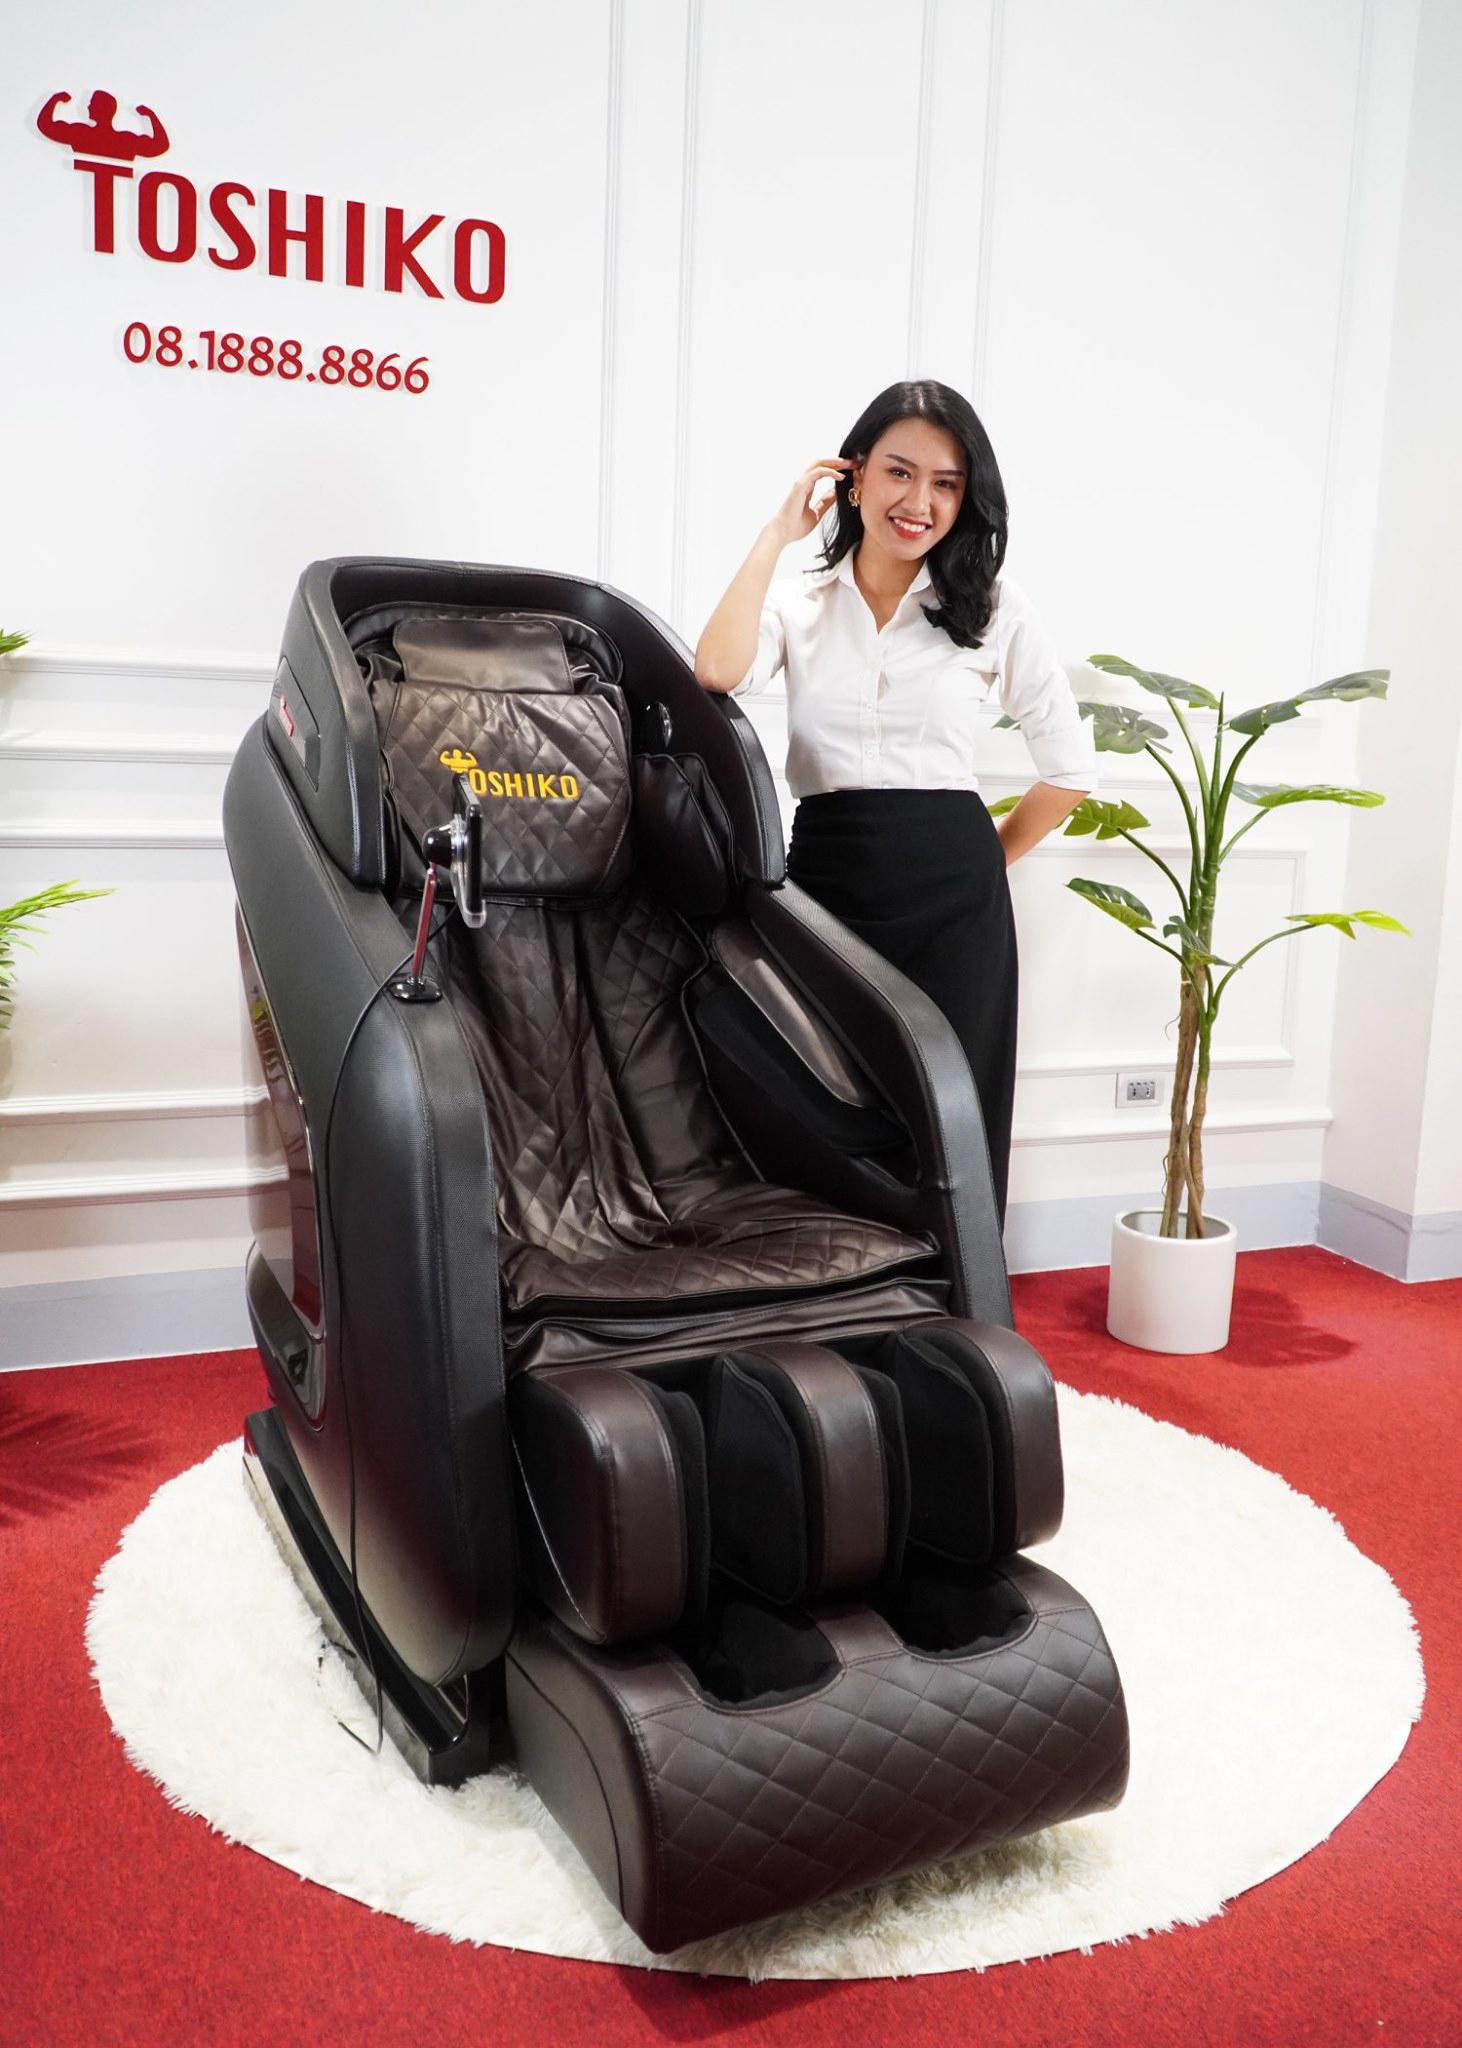 ghế massage hồng ngoại-2